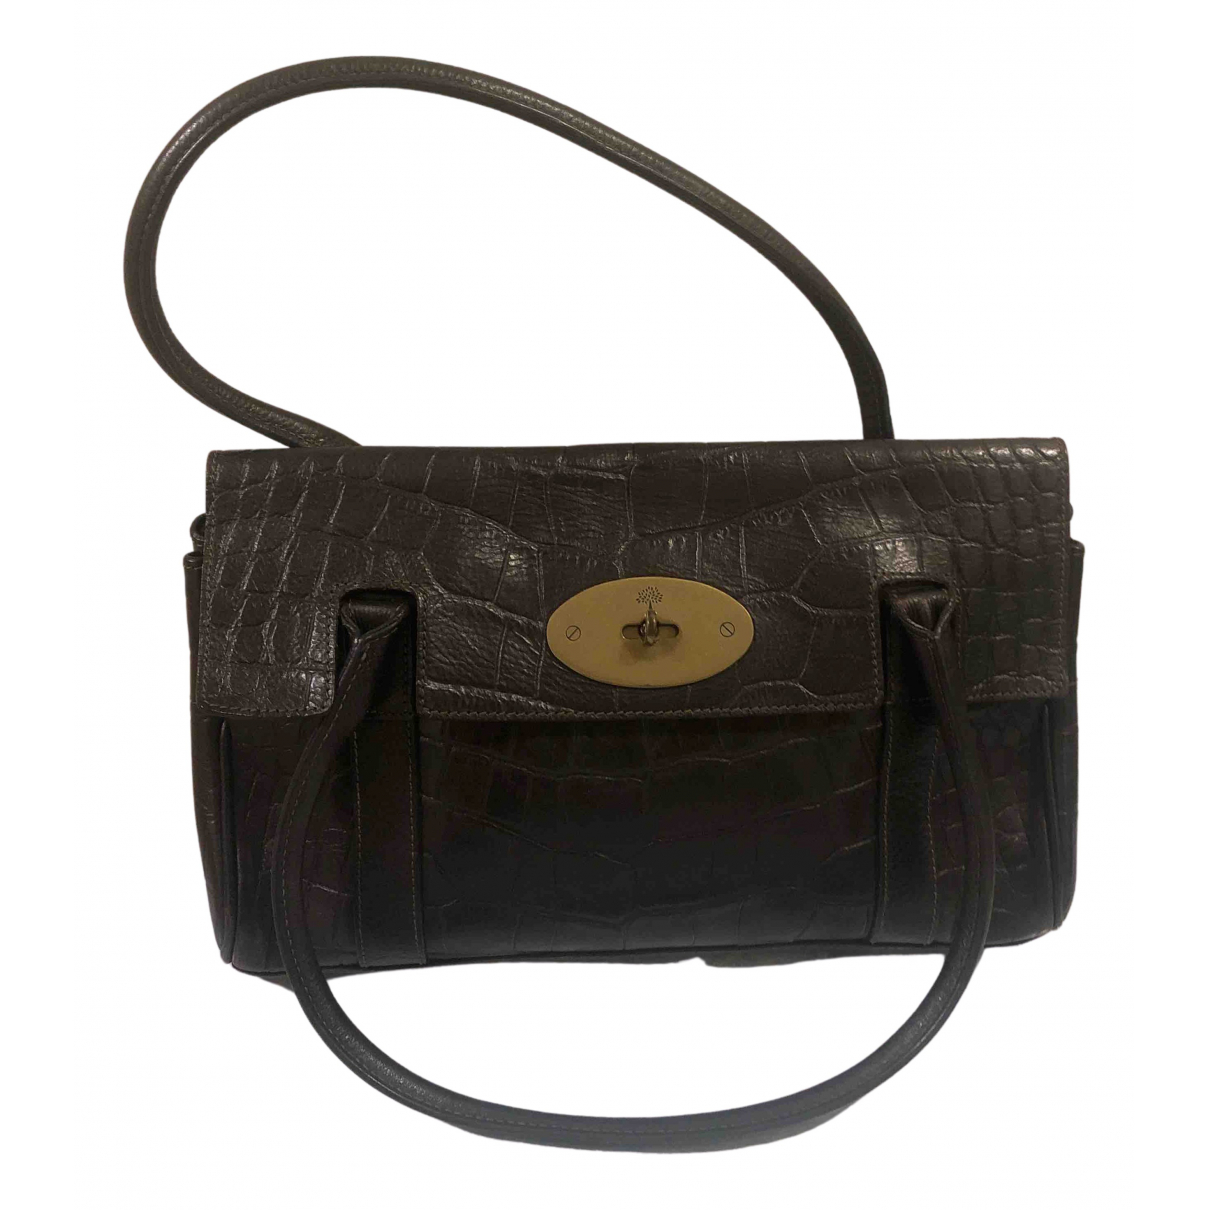 Mulberry - Sac a main Bayswater pour femme en cuir - marron